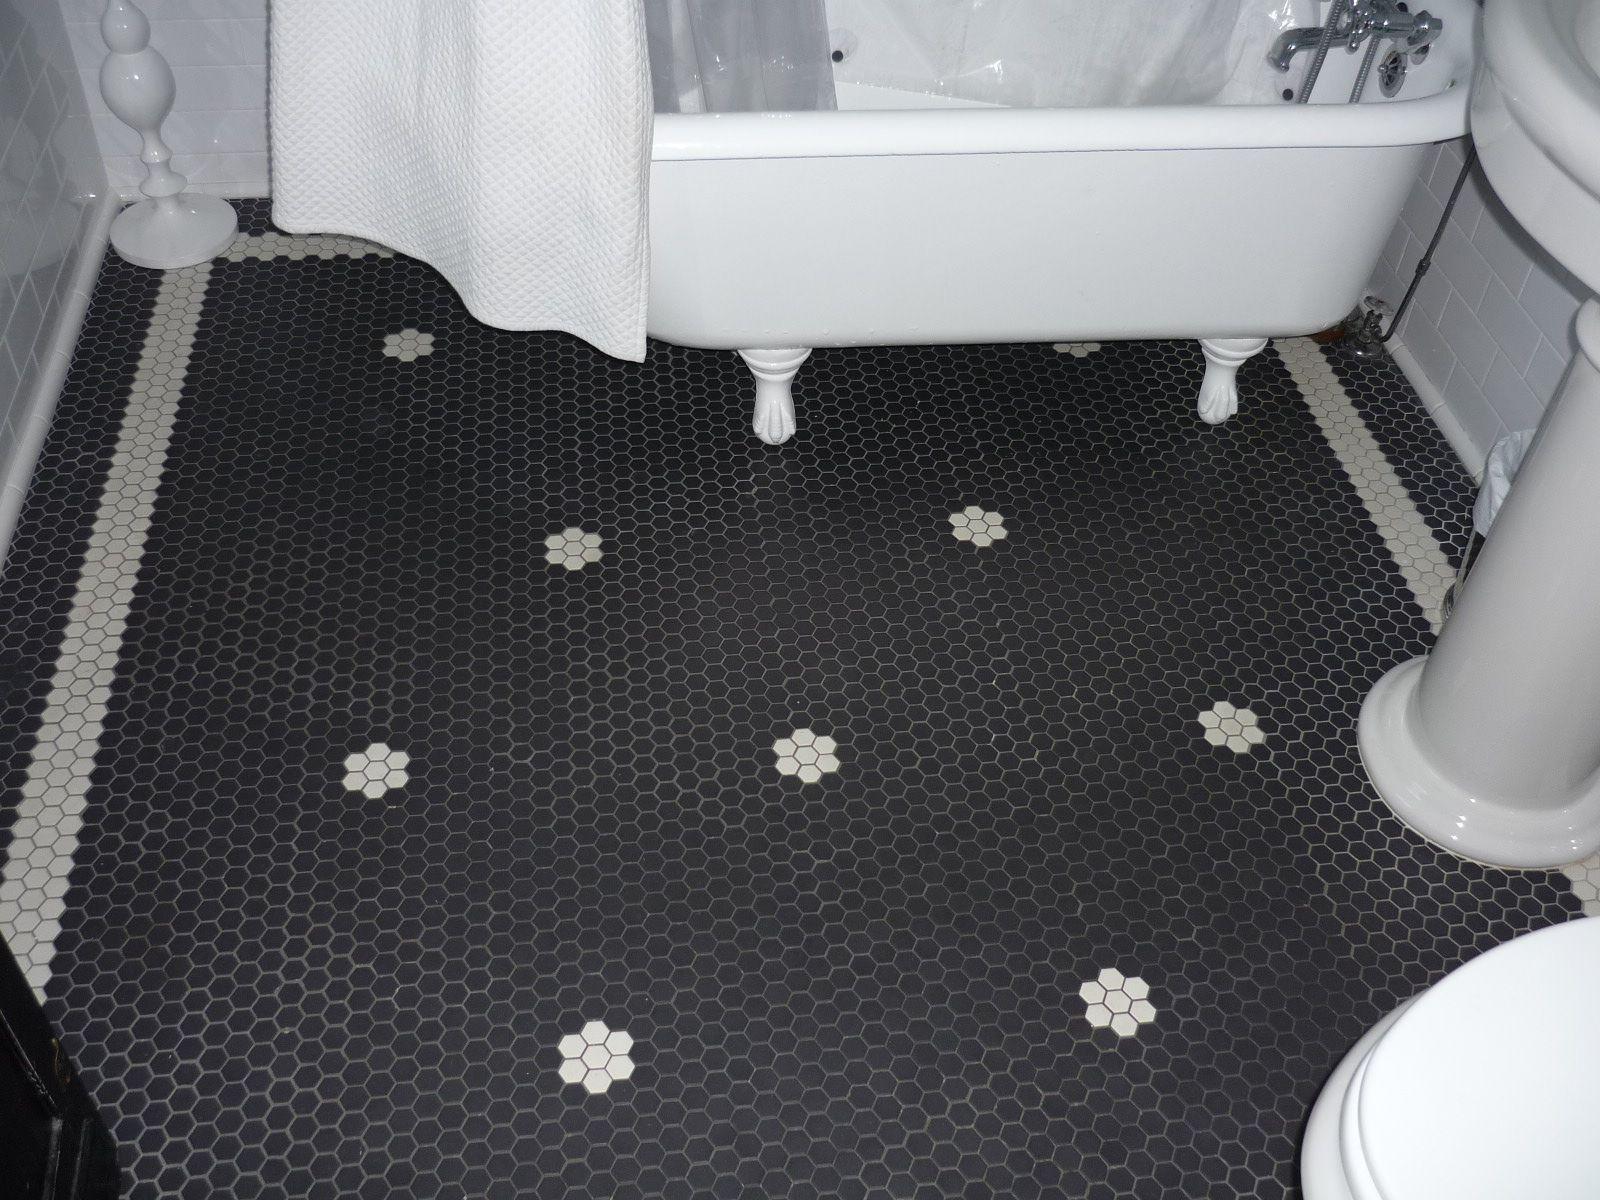 Love This Antique Reproduction Hex Tile Floor